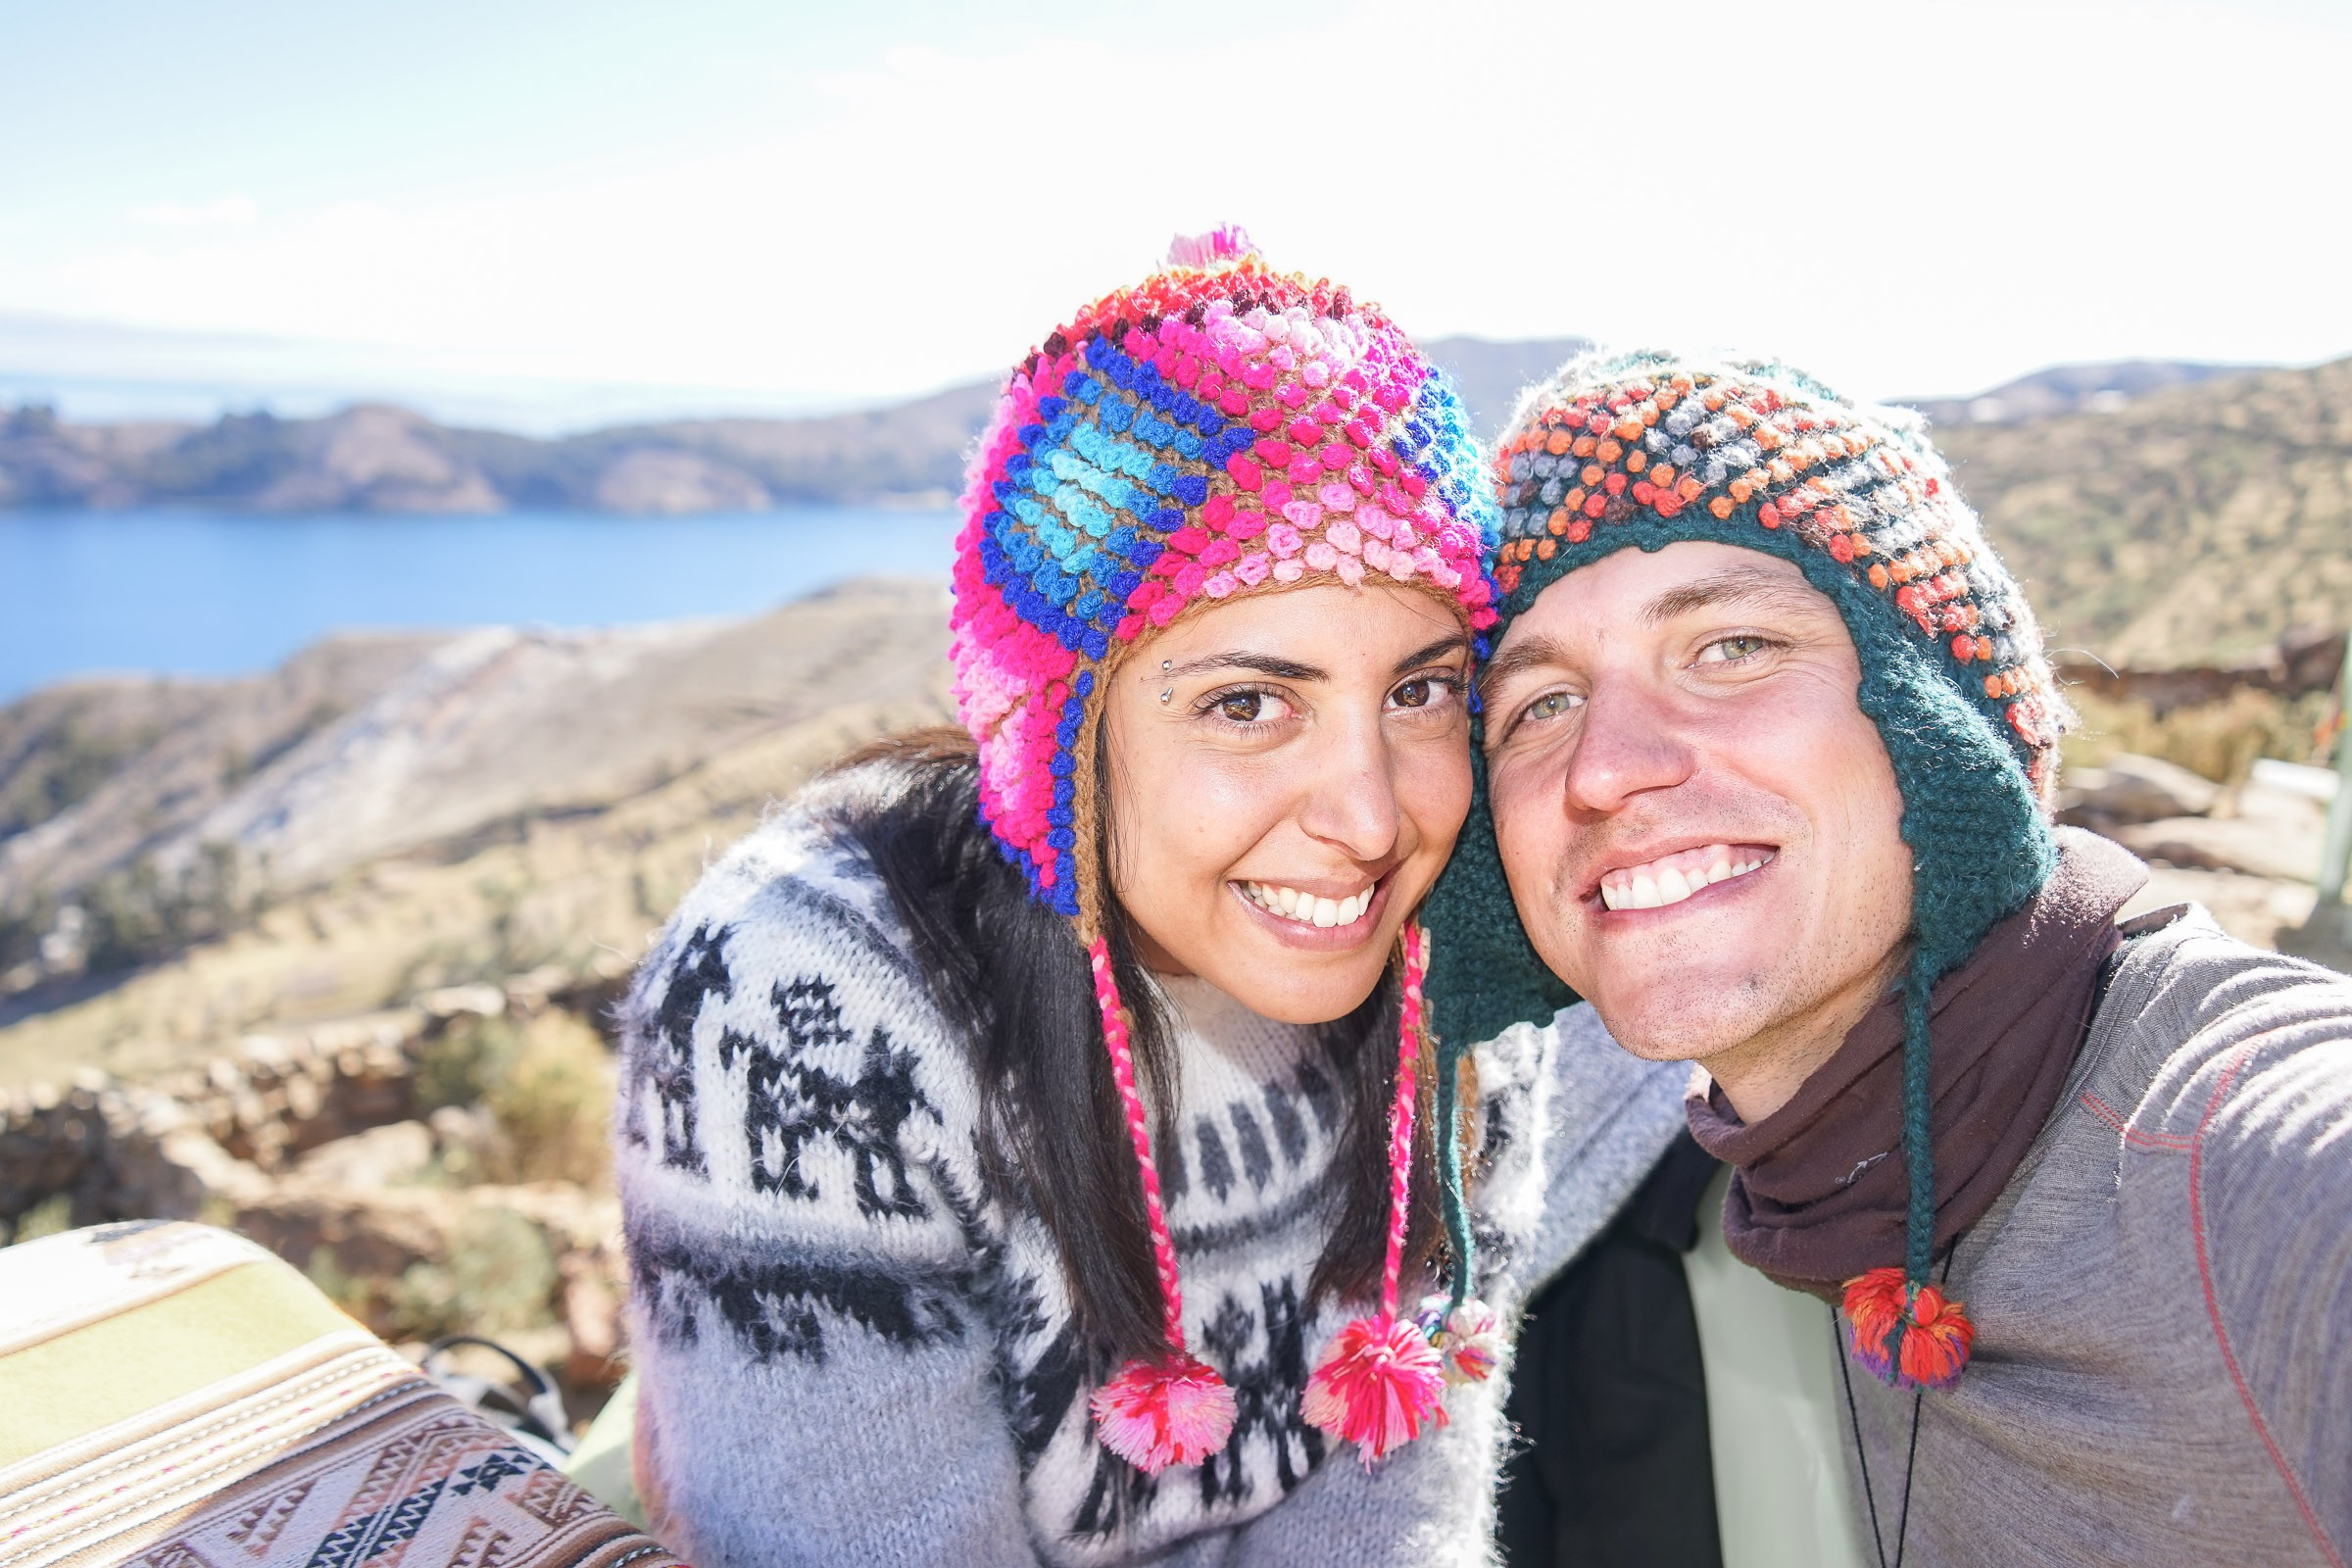 bolivie-isla-del-sol-selfie-09328